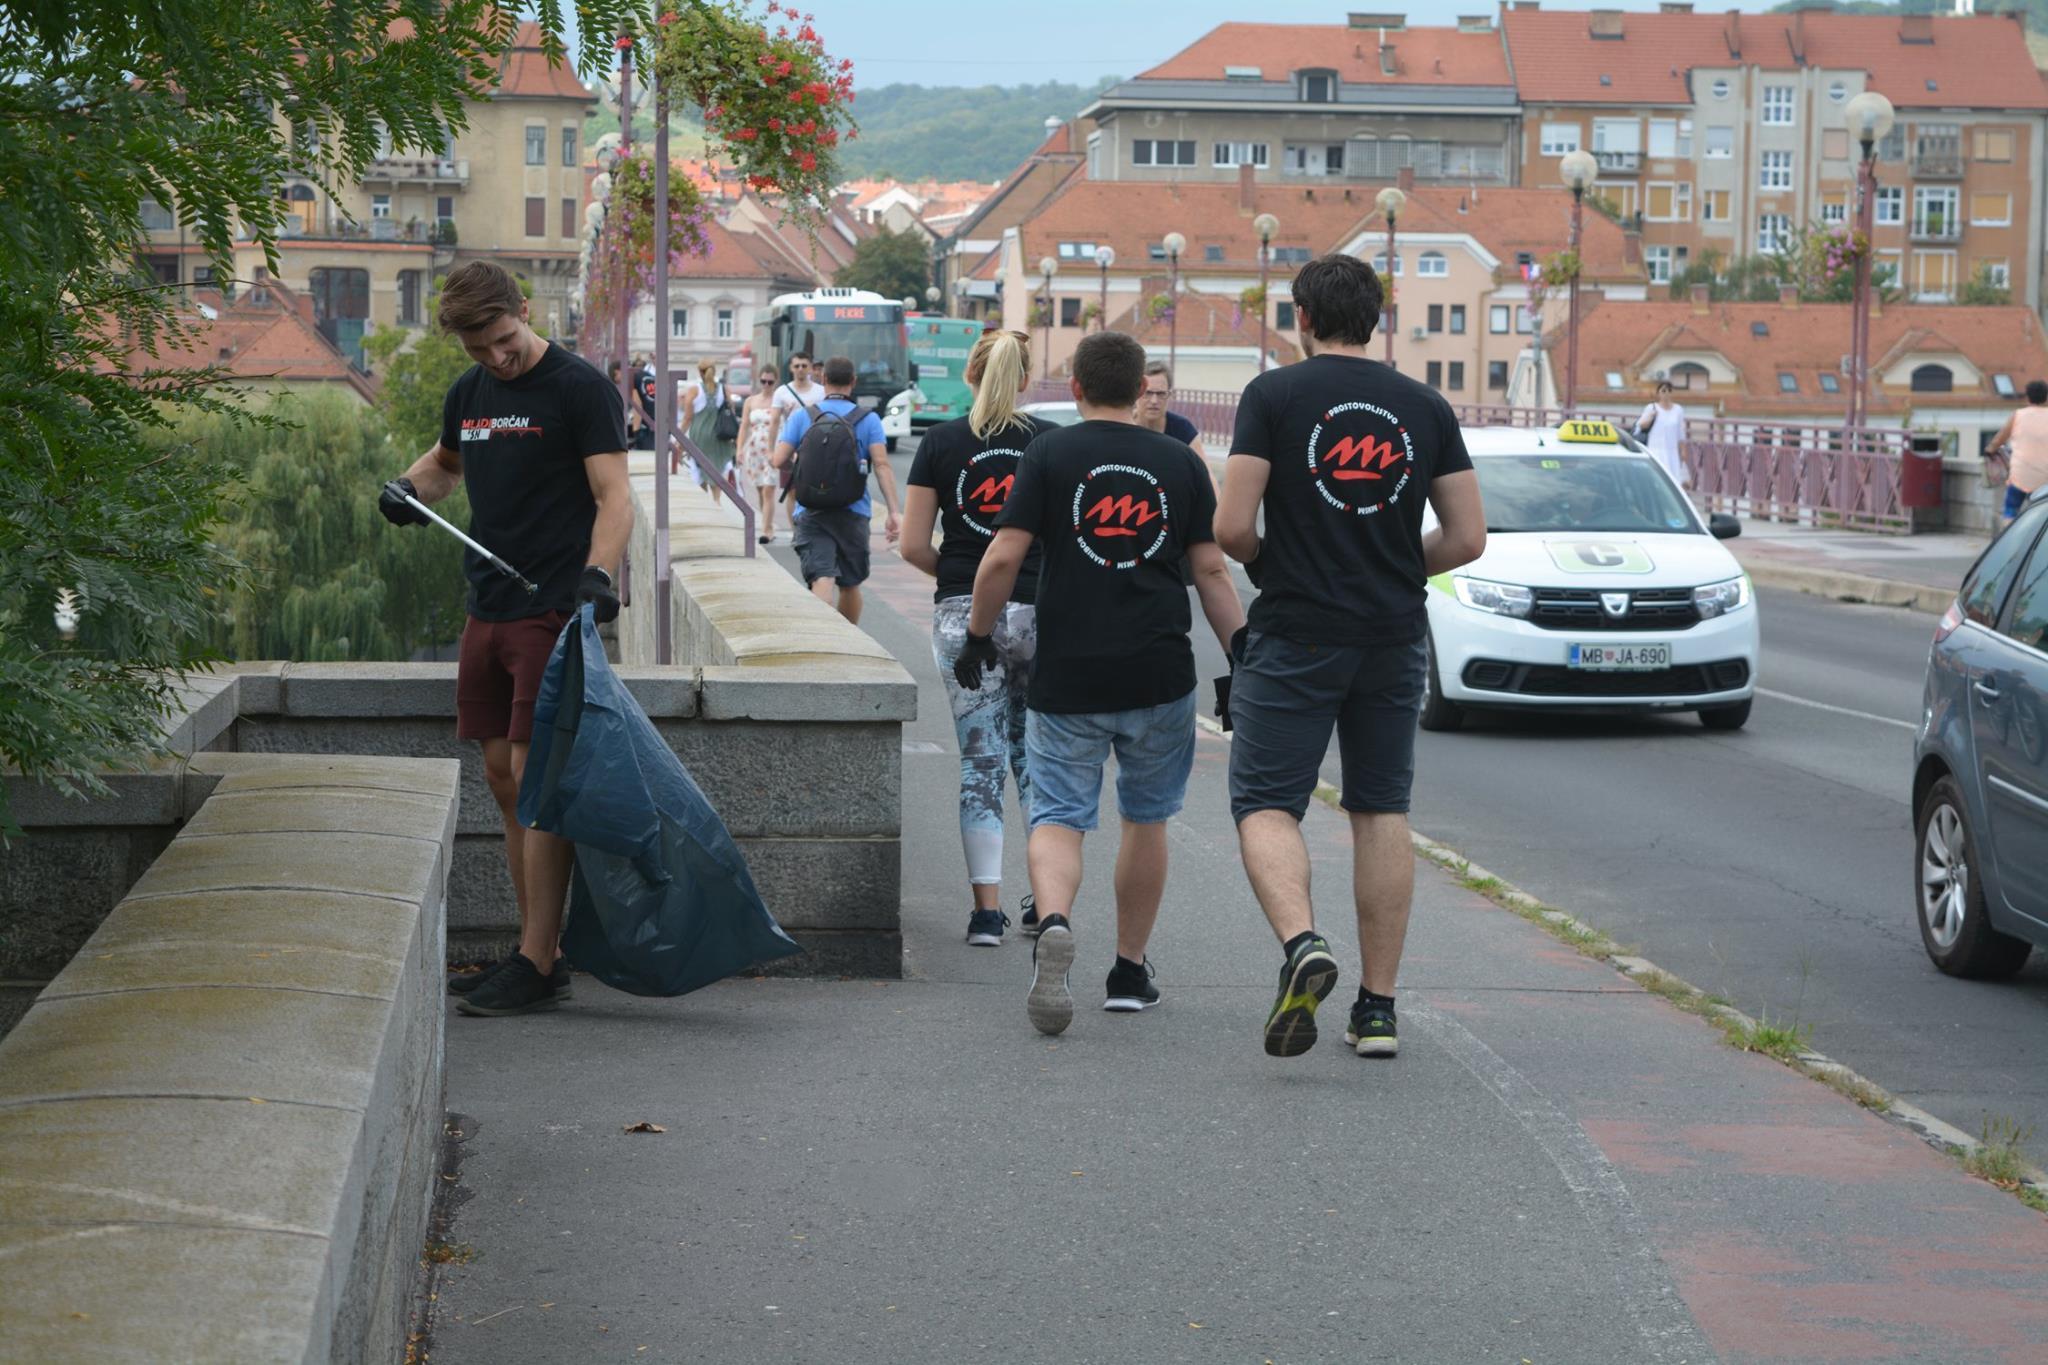 Mladiborčani letos znova s prostovoljskimi akcijami